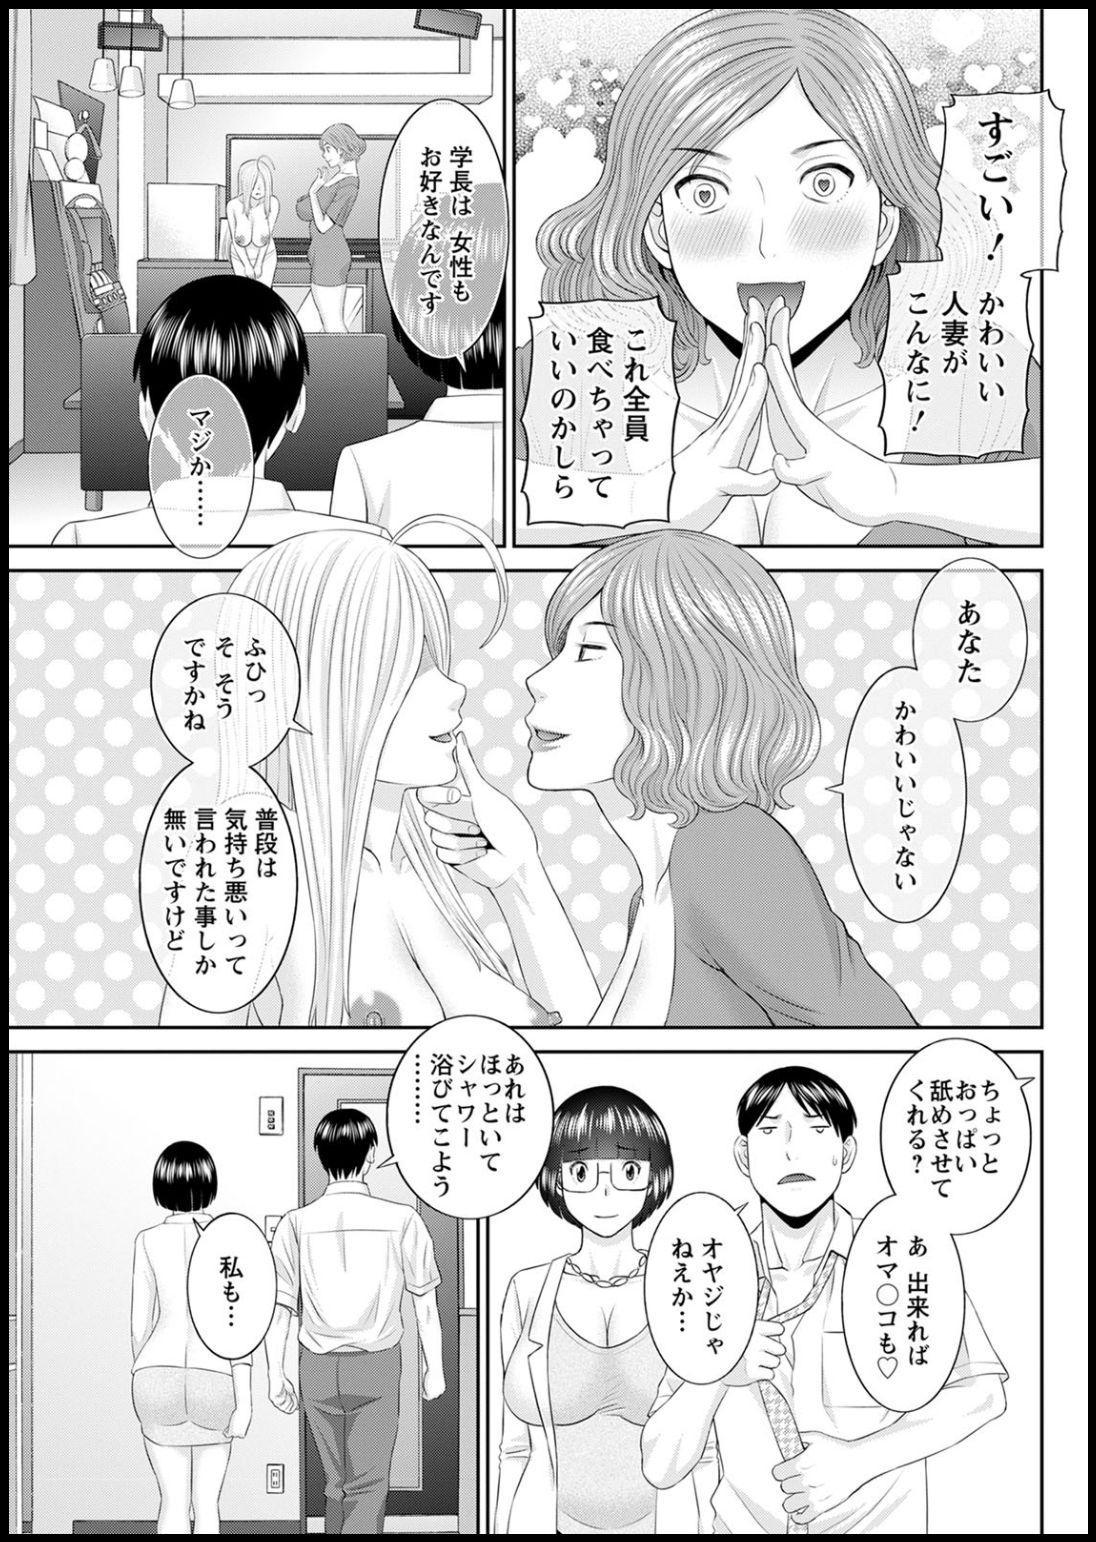 [Kawamori Misaki] Kaikan Hitotsuma Gakuen Ch. 1-6, 8-20 [Digital] 319